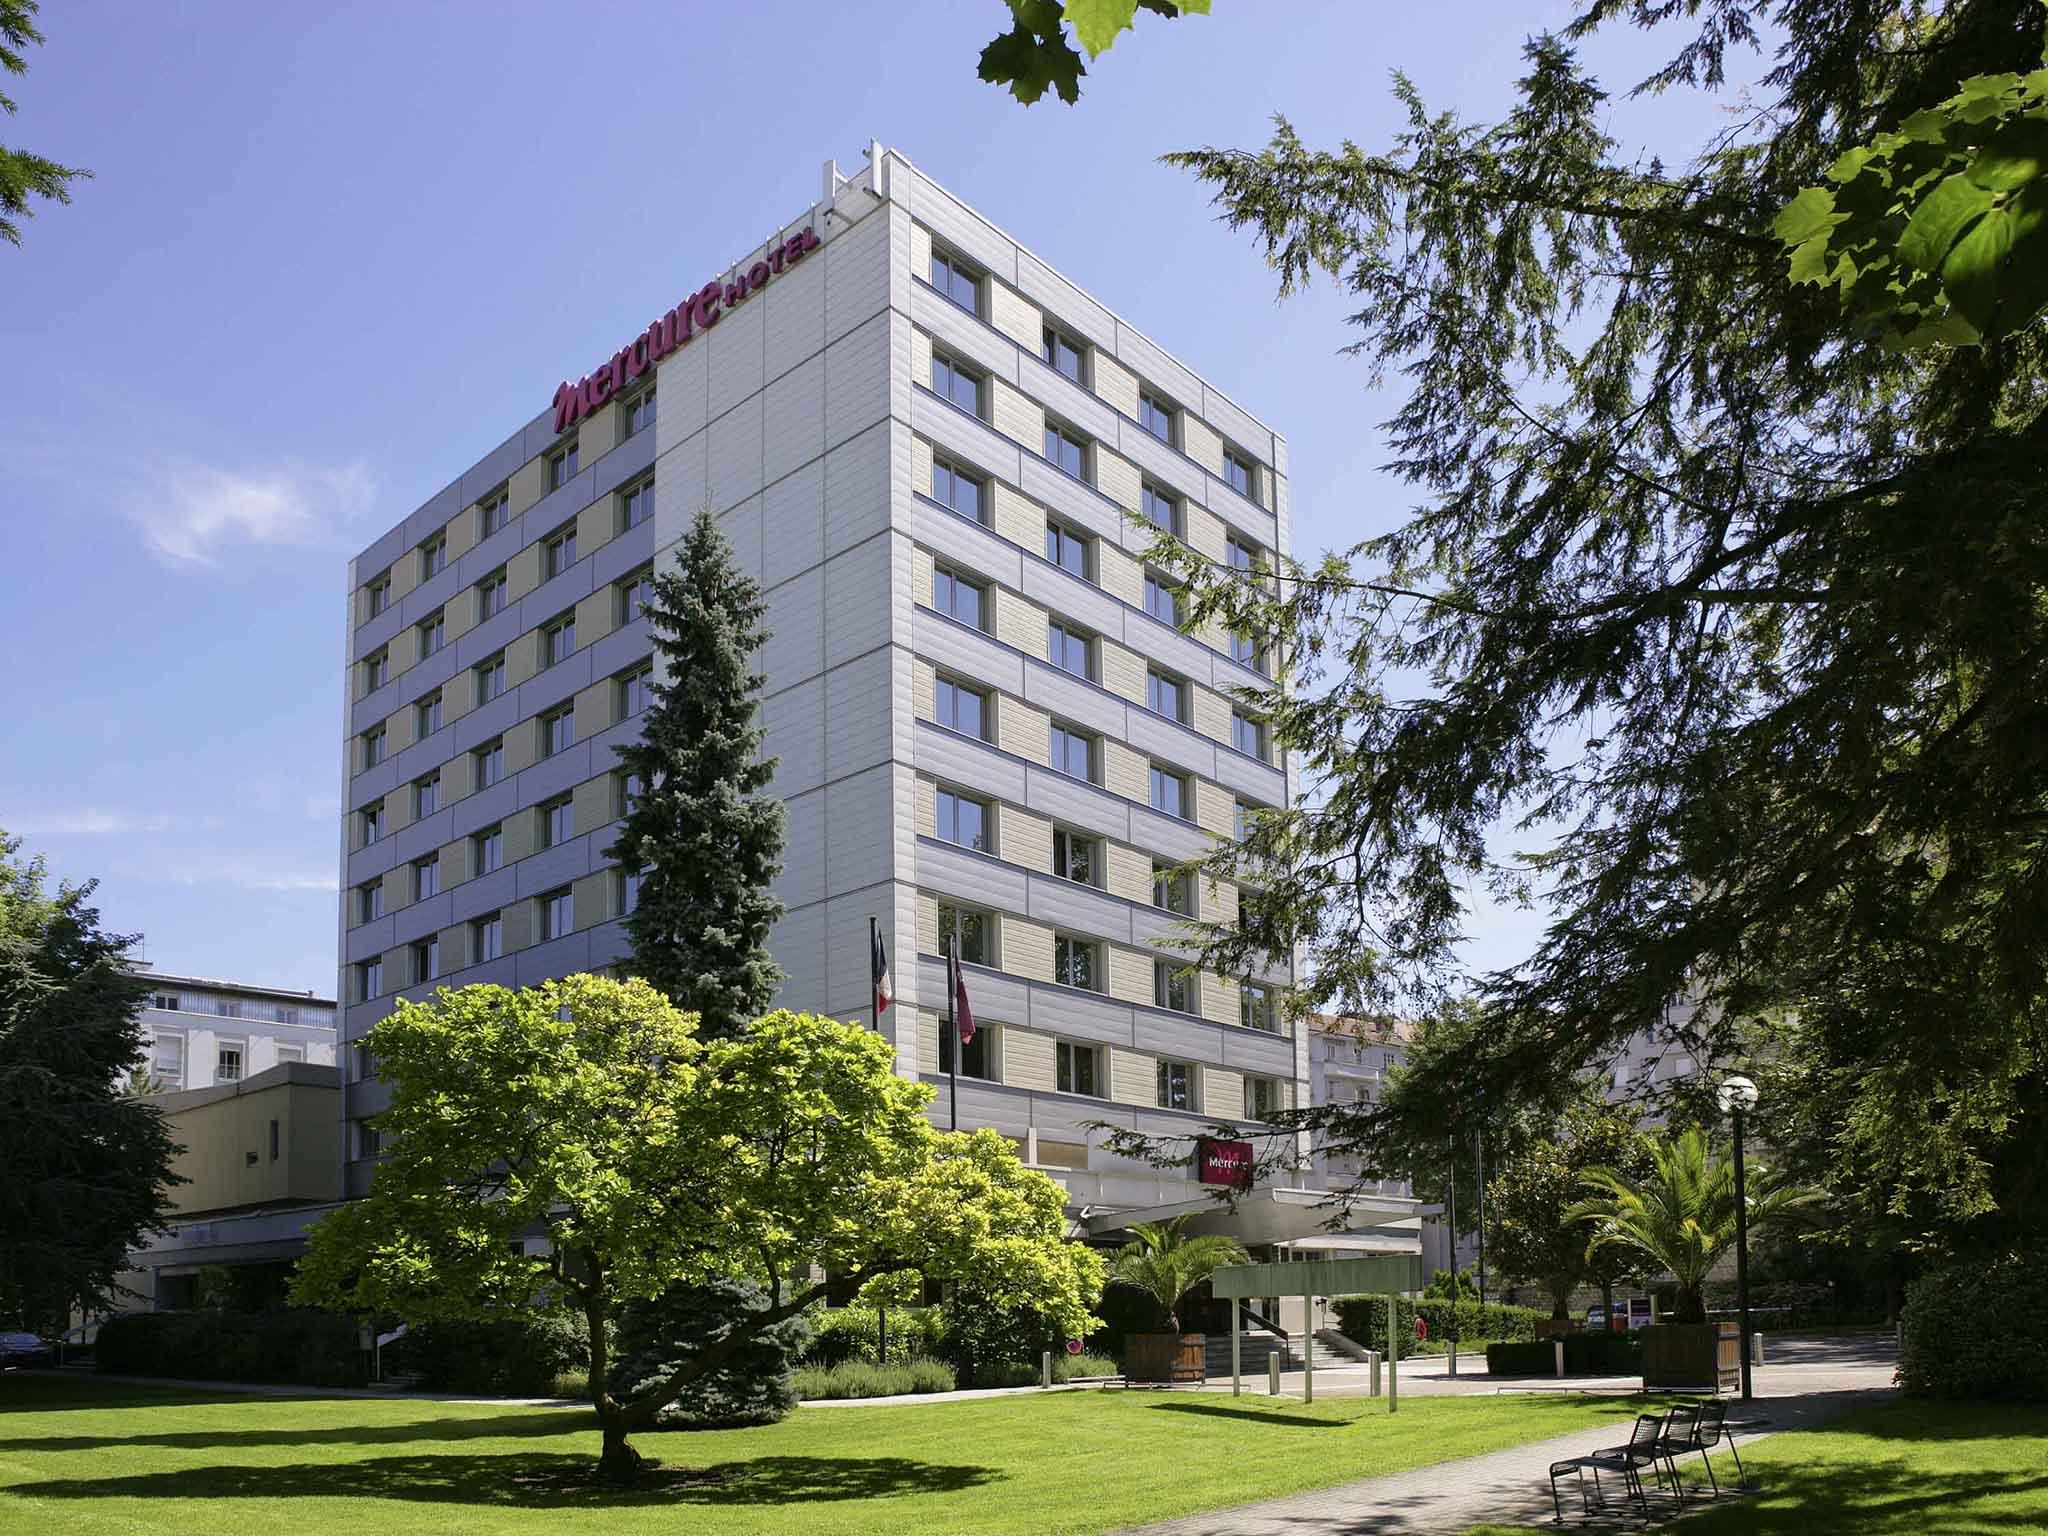 Otel – Hôtel Mercure Besançon Parc Micaud